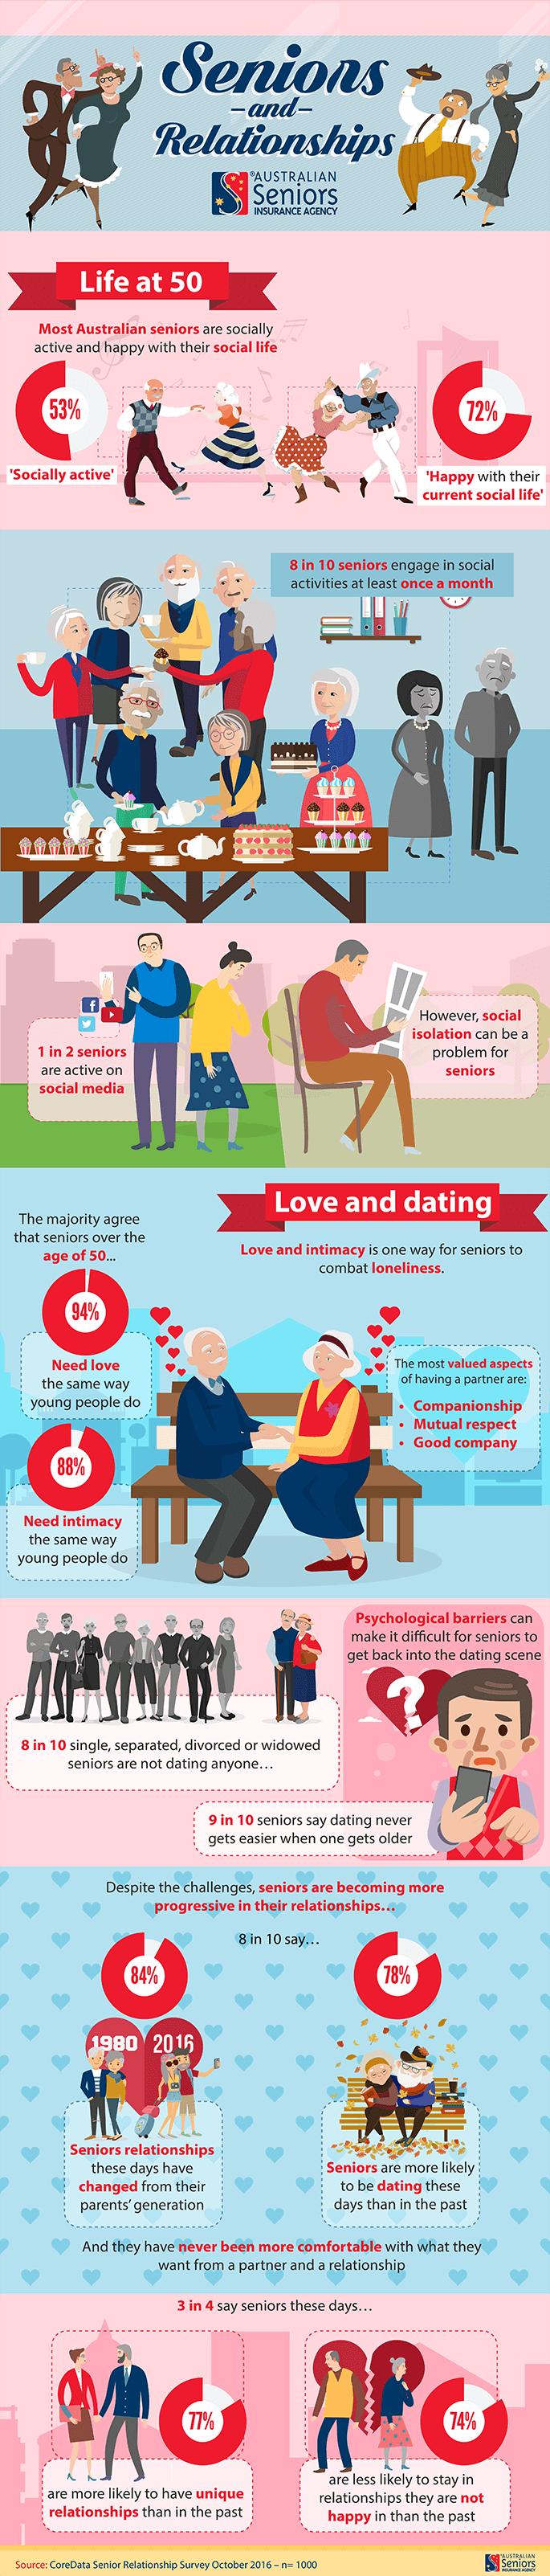 The Australian Seniors Series: Seniors and Relationships (infographic)